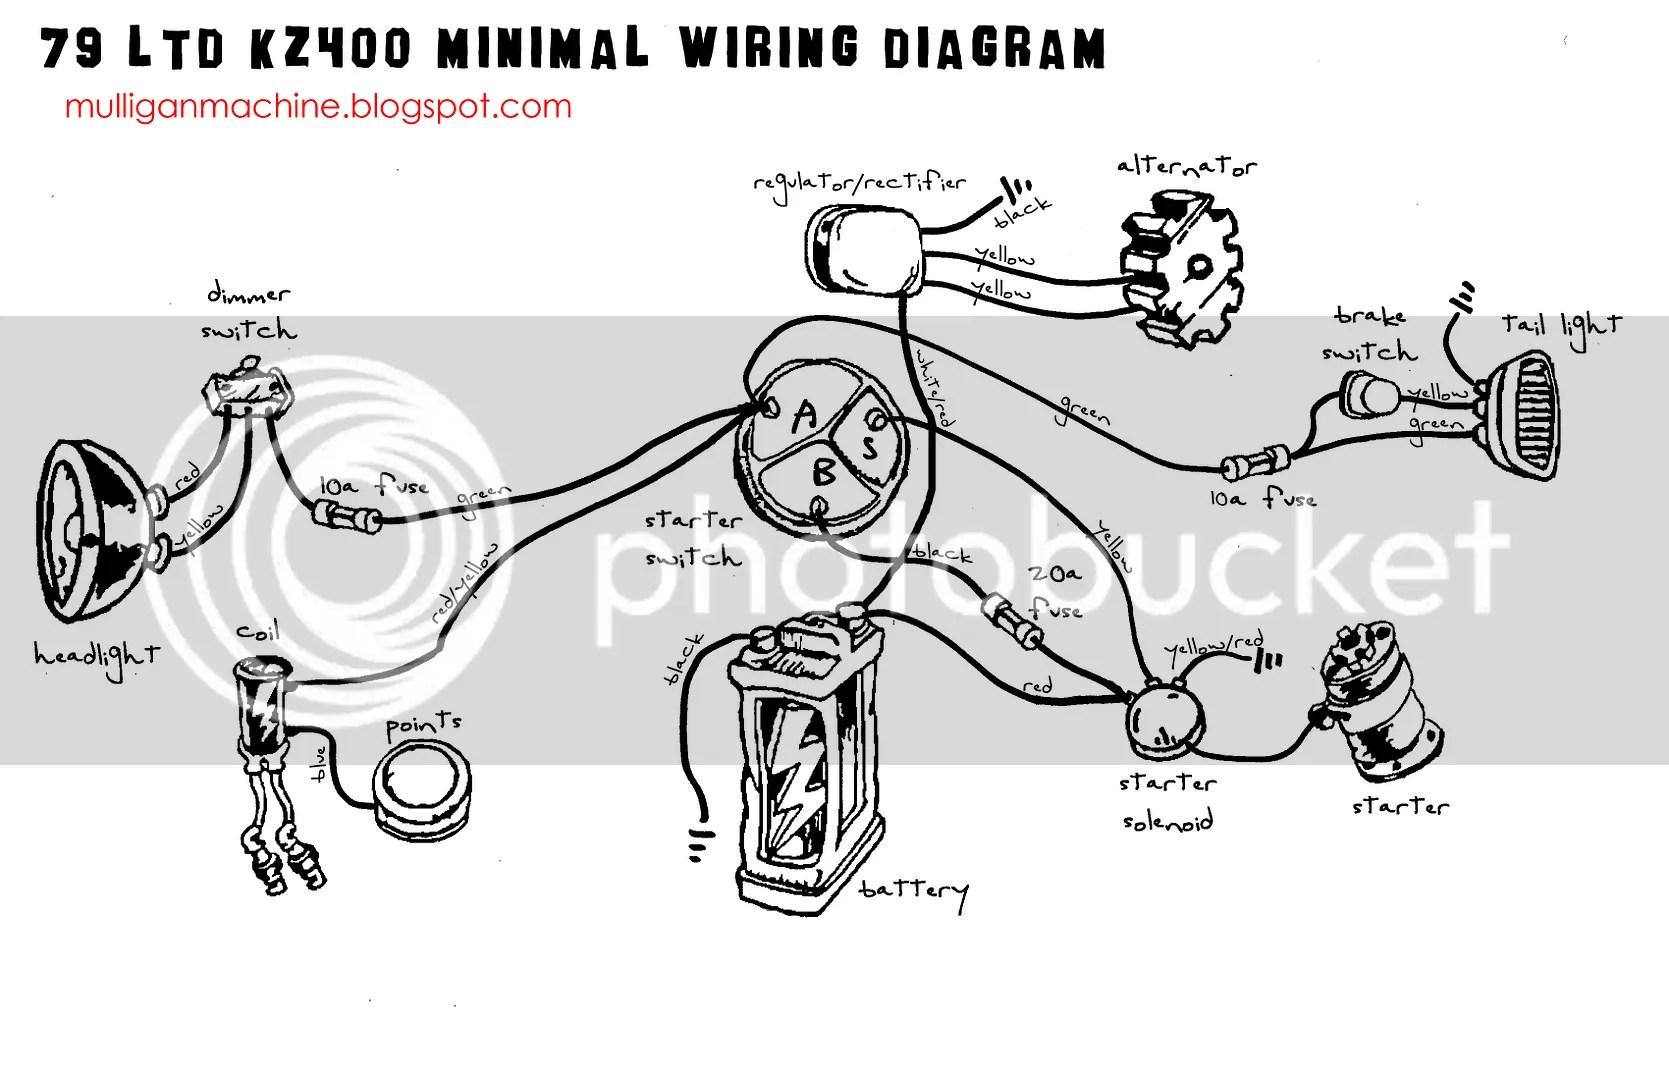 hight resolution of k z 400 wiring diagram wiring diagram operations76 kz400 wiring diagram wiring diagram basic 76 kz400 wiring